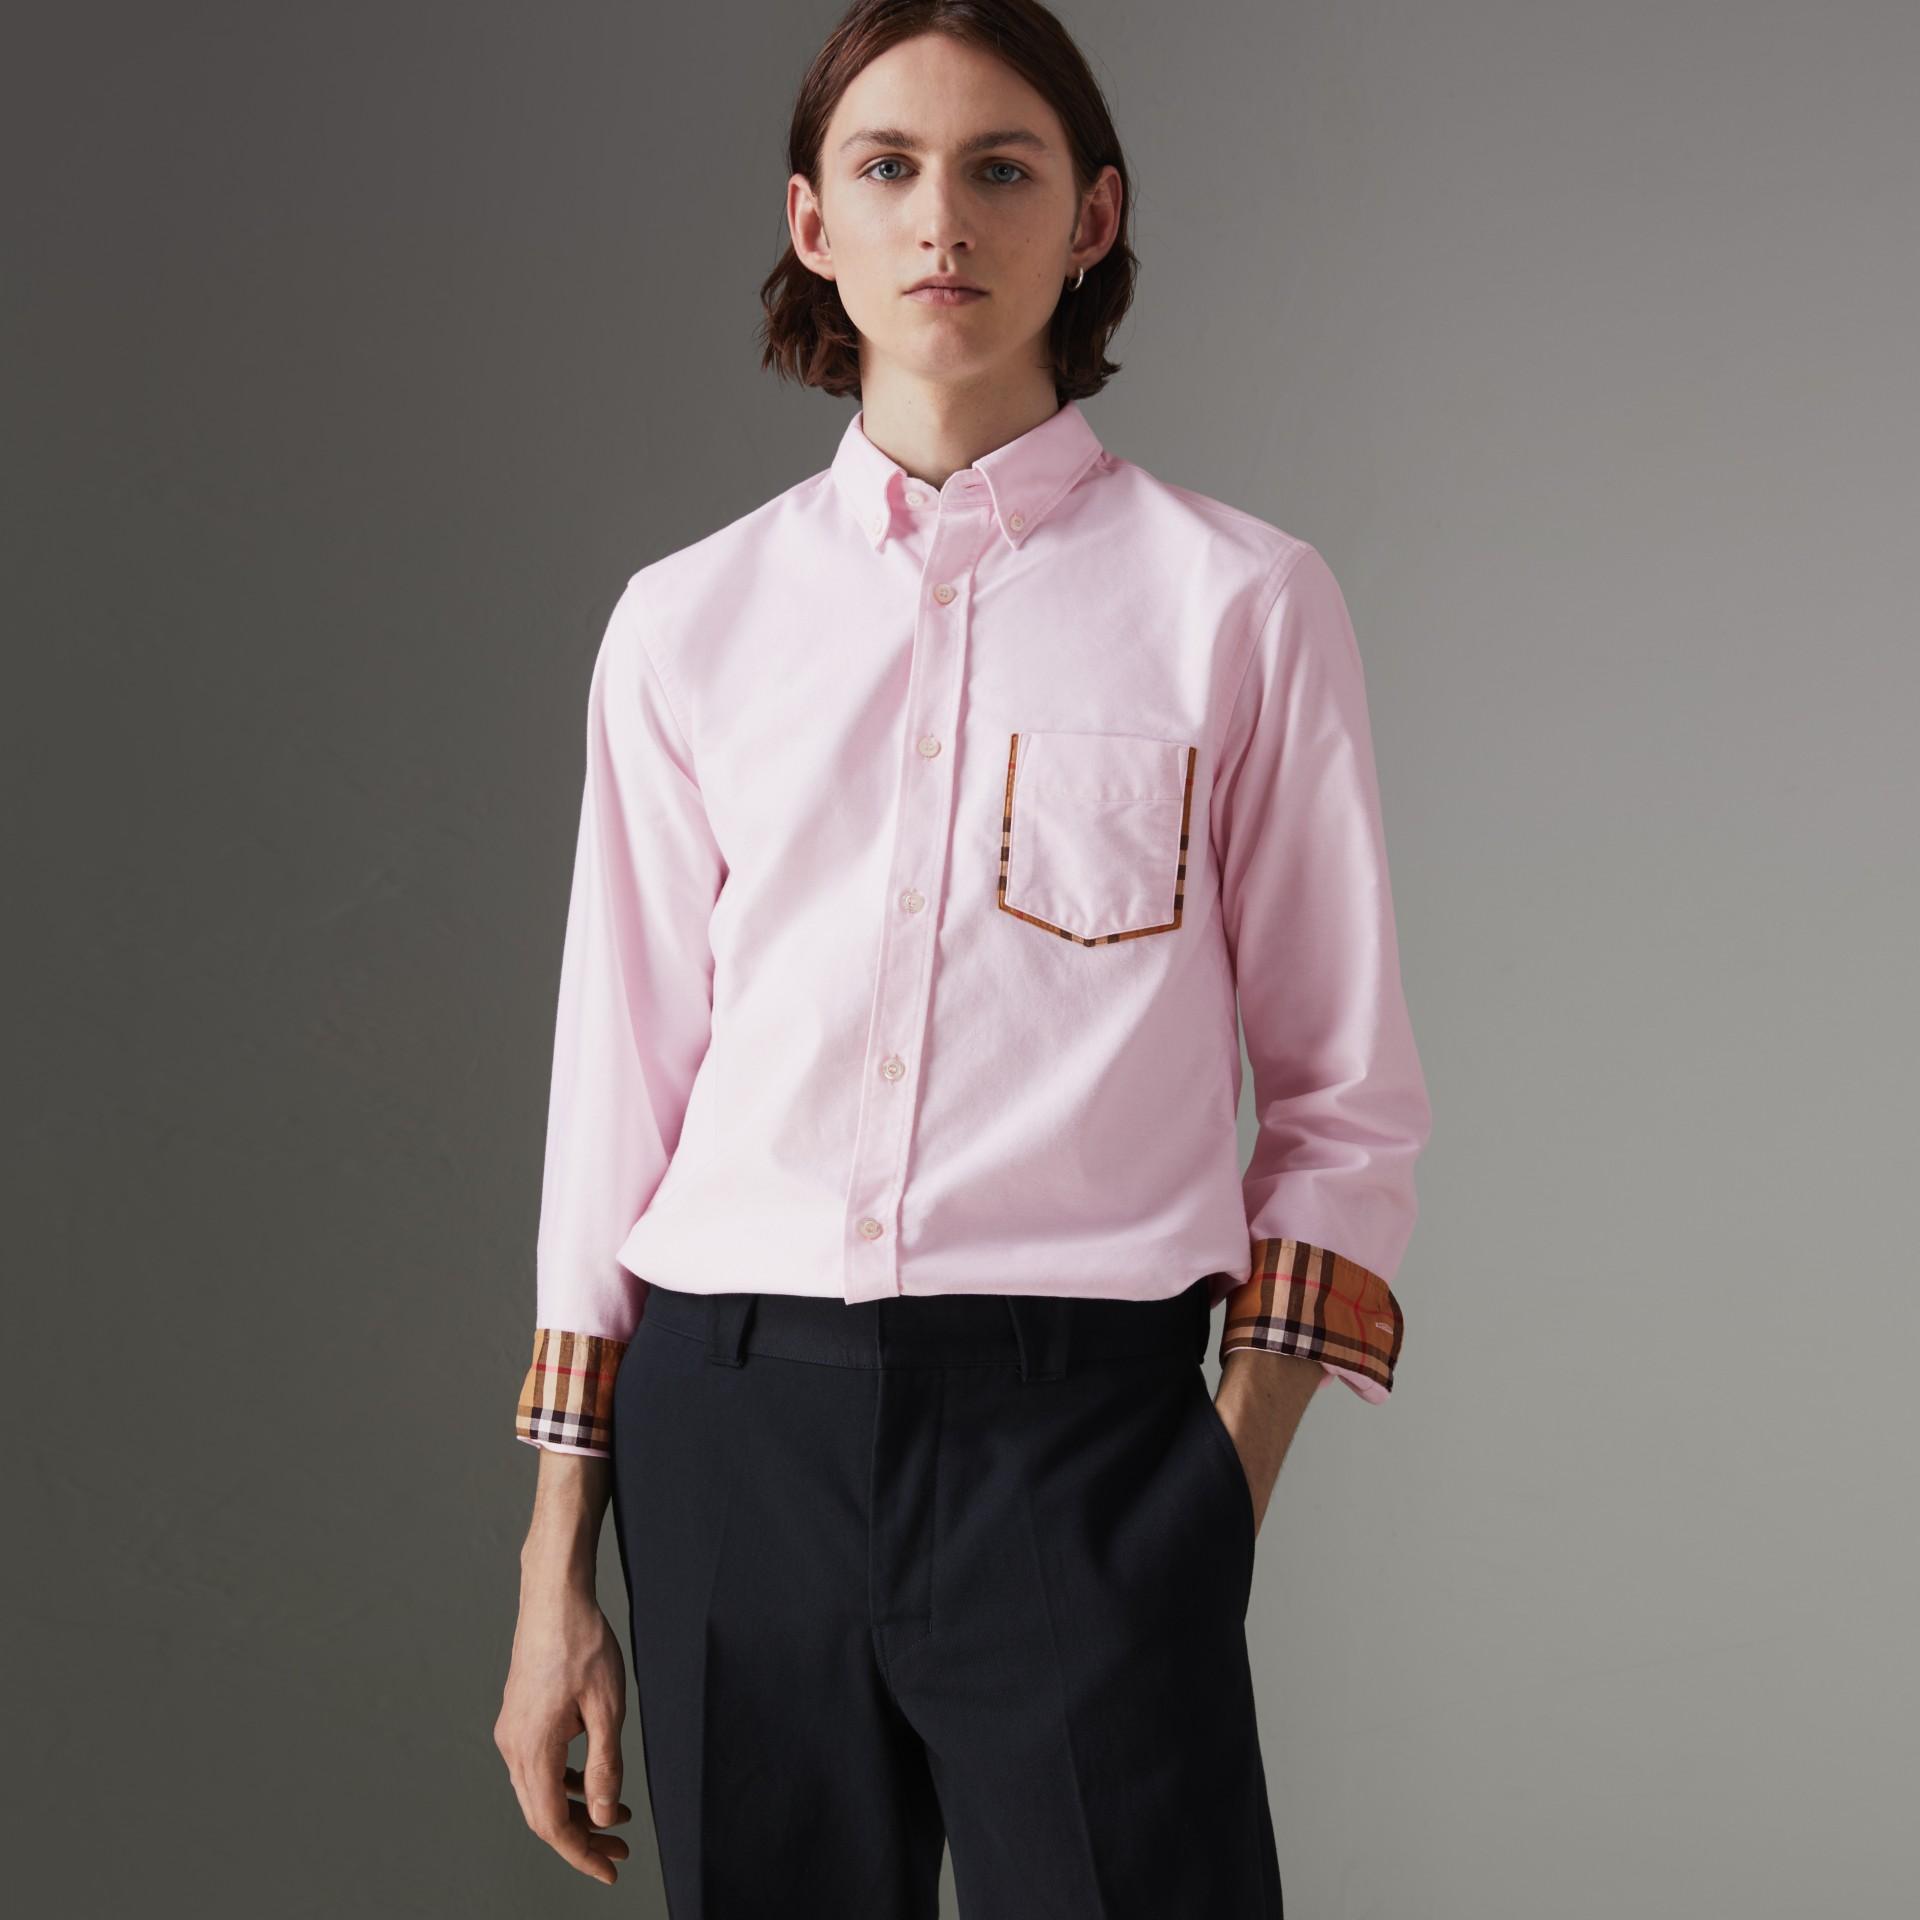 e95a21bc1e37bb Burberry Oxford-Hemd Aus Baumwolle Mit Karodetail In Pink